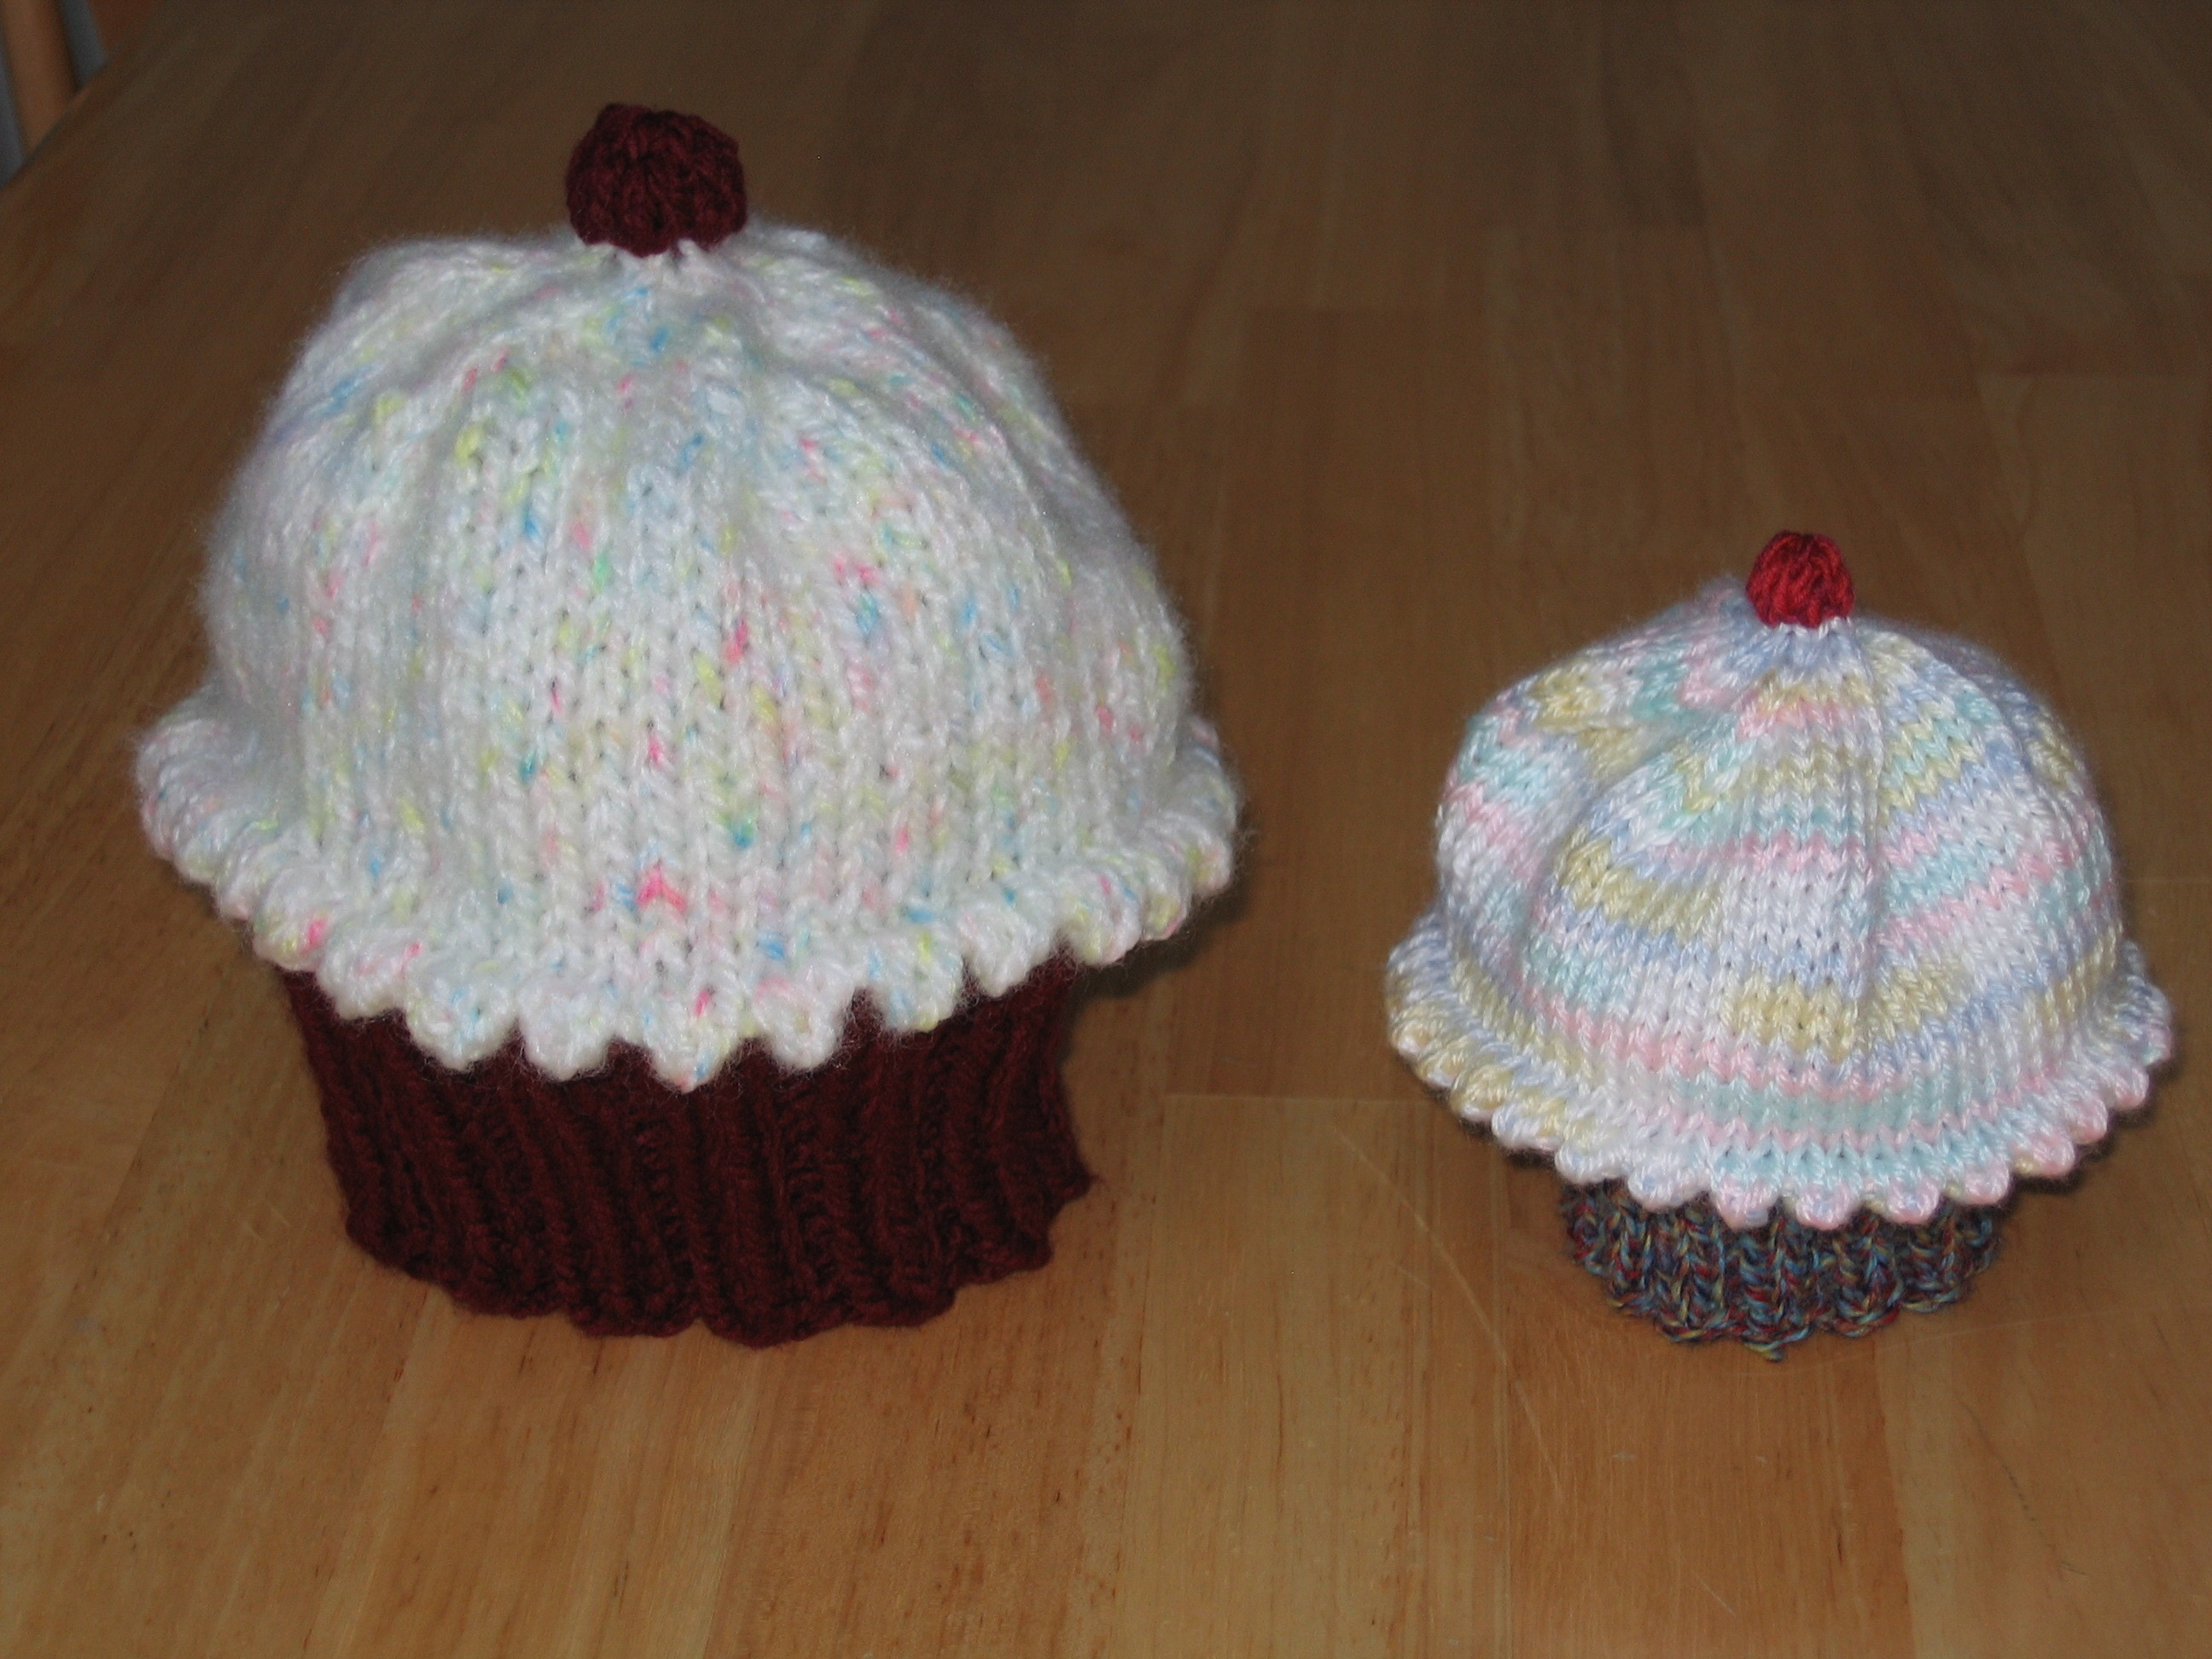 Cupcake Knitting Pattern Easy : Knitted Cupcake Hat Pattern A Knitting Blog